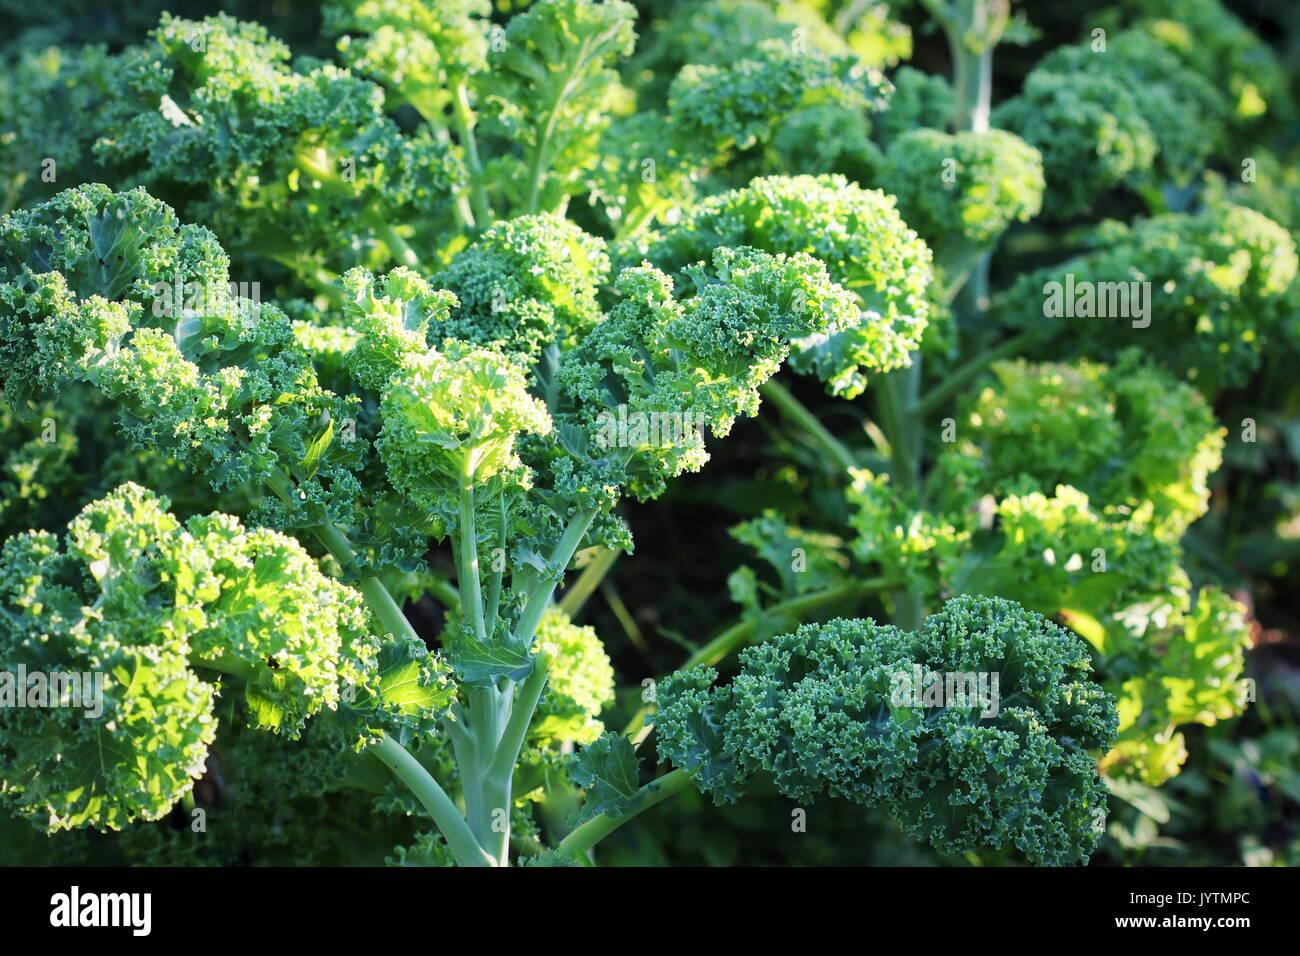 Junge kale im Gemüsegarten wachsen Stockbild